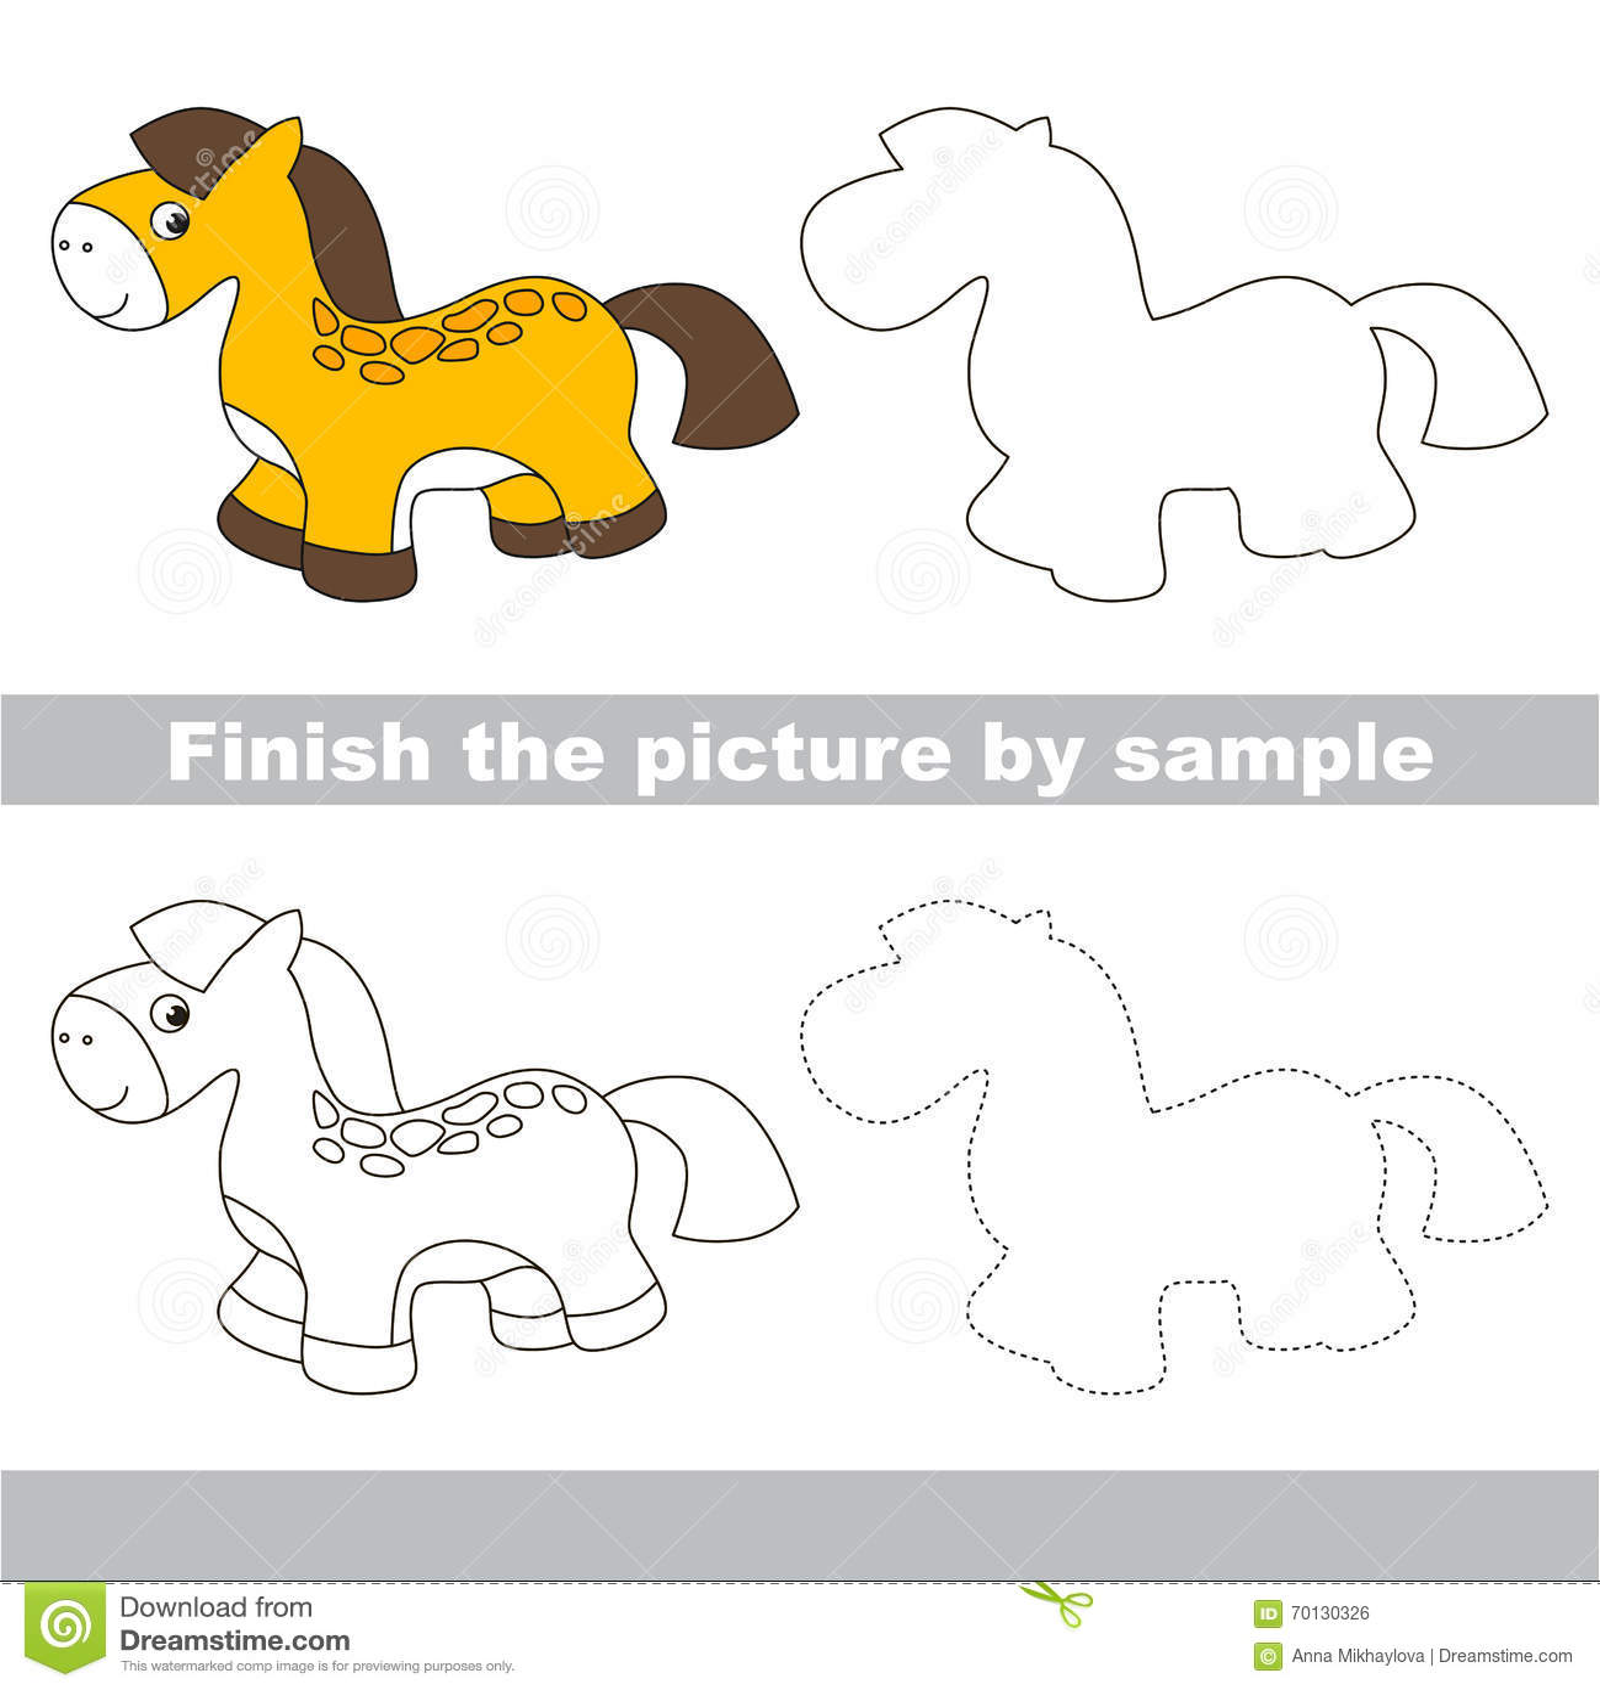 Toy Horse Drawing Worksheet Stock Illustration Illustration Of Finish Task 70130326